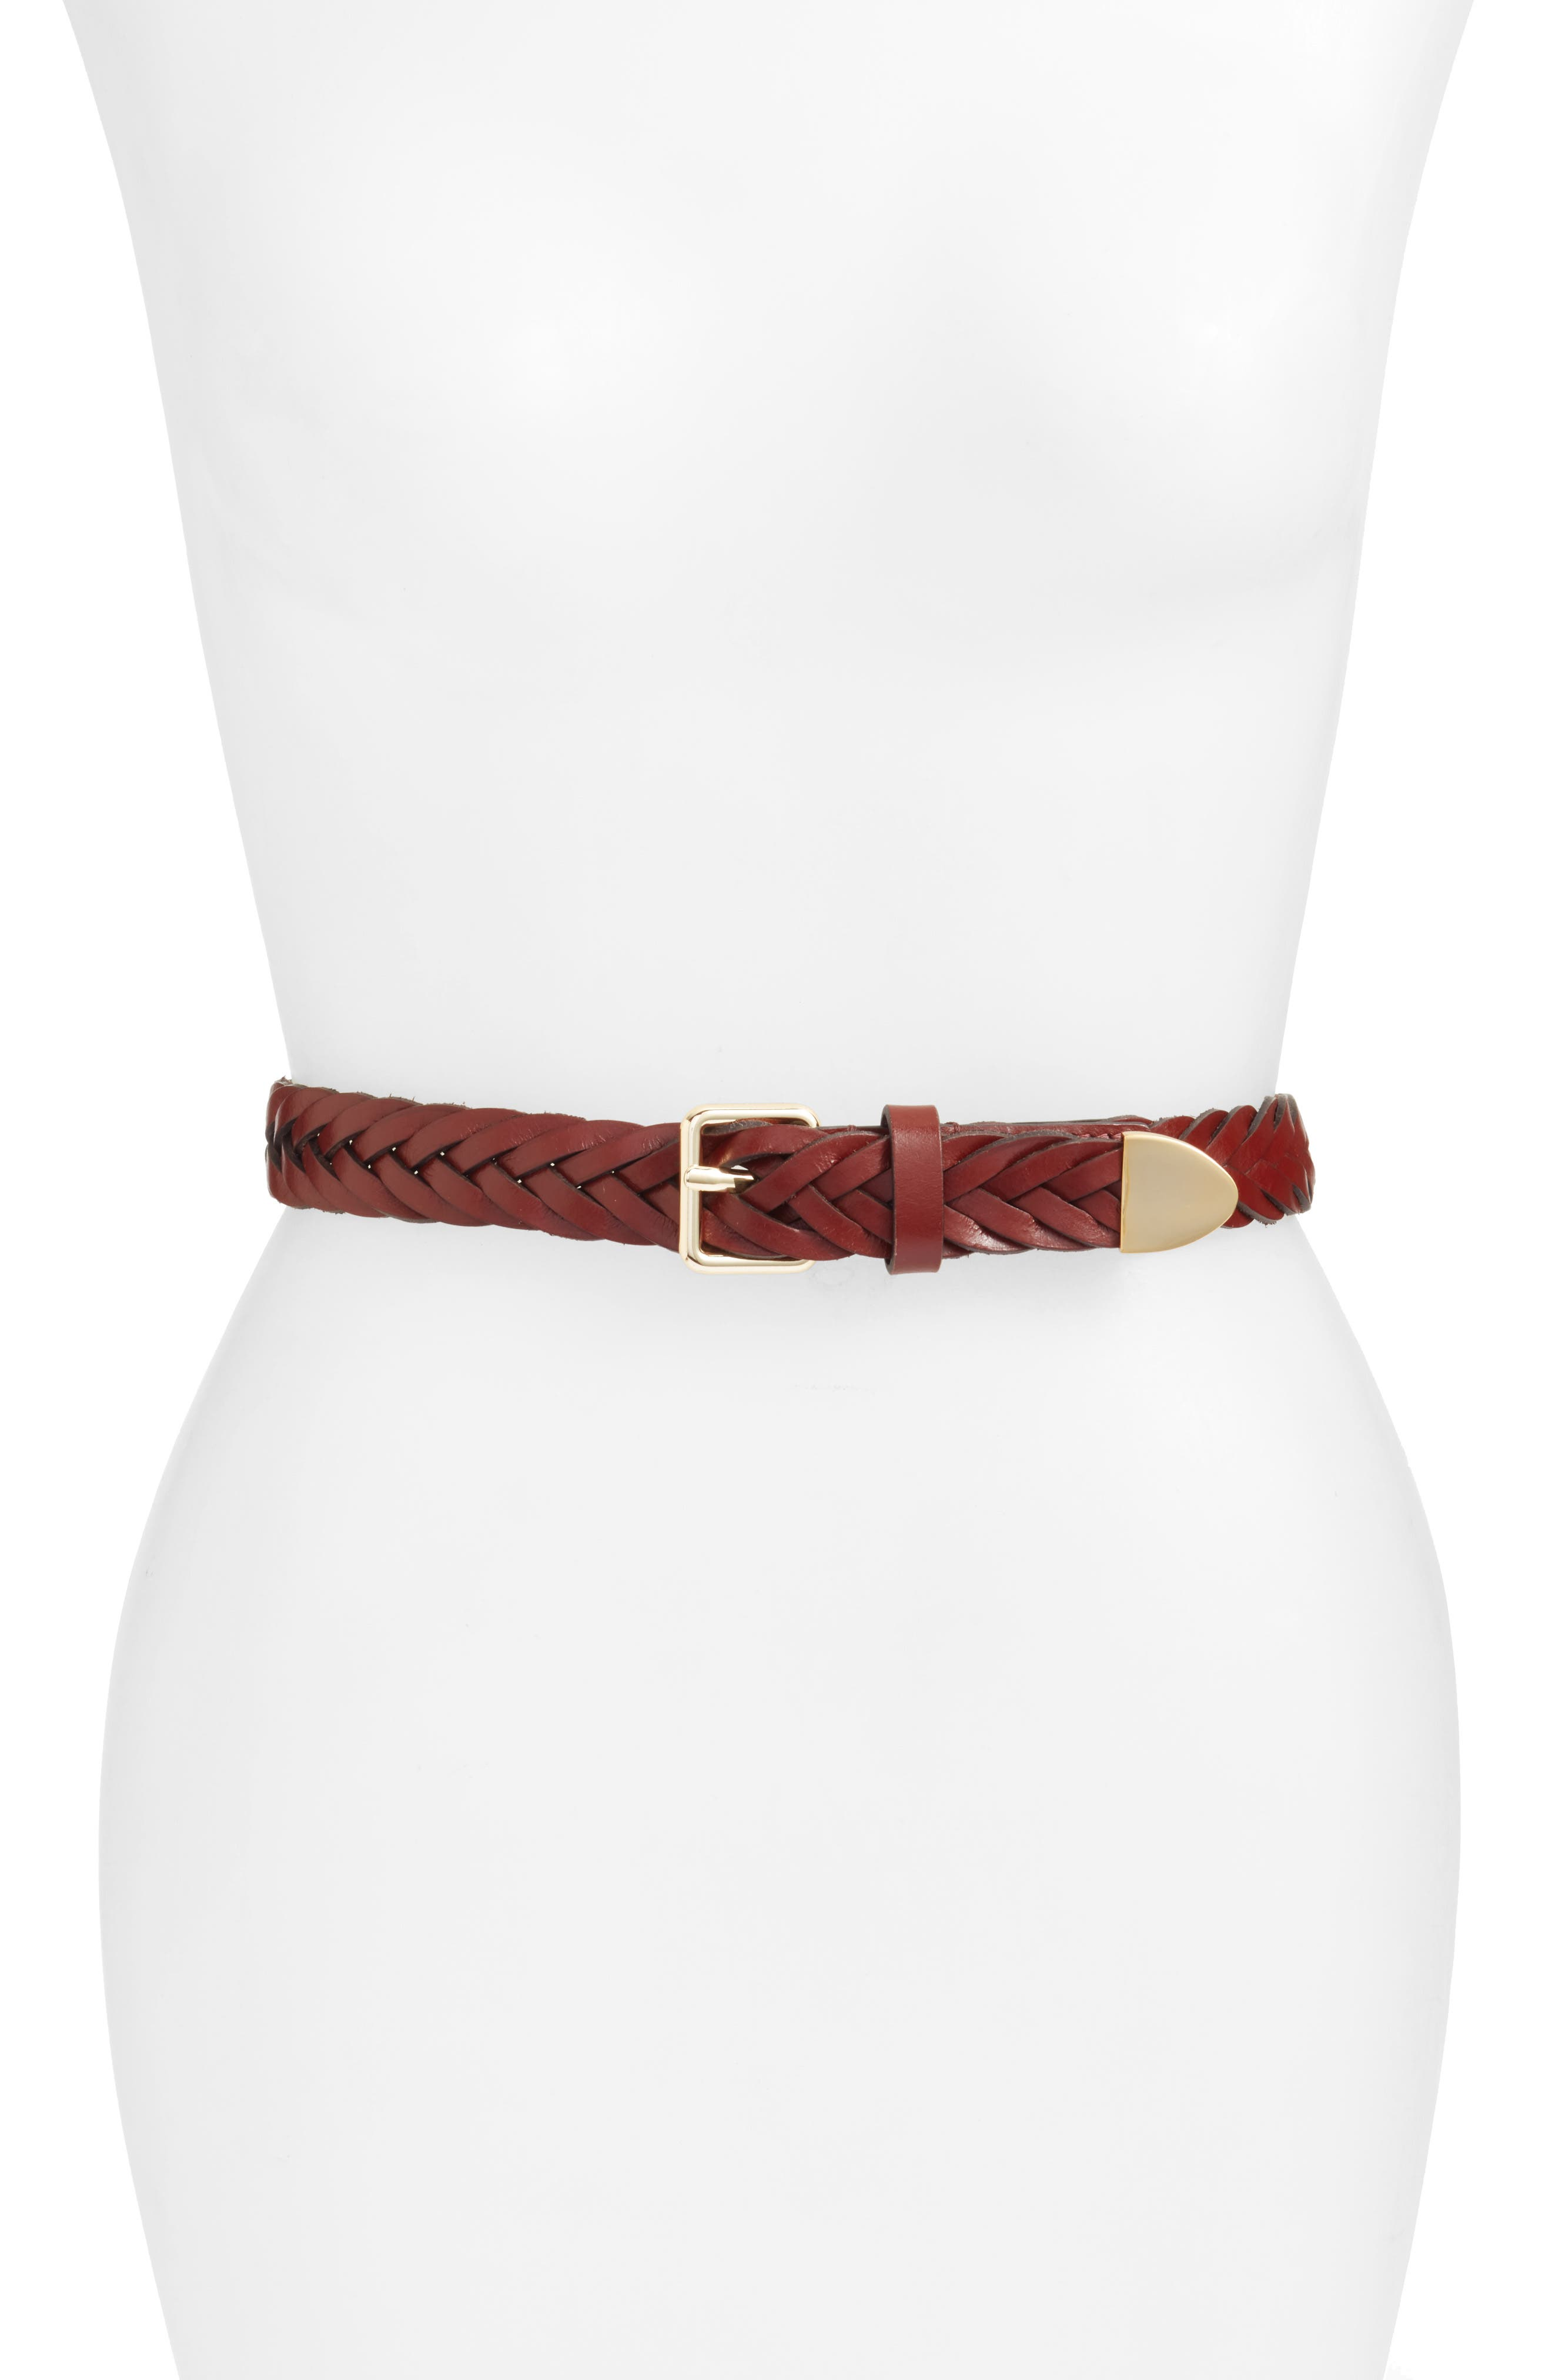 Rebecca Minkoff Braided Leather Belt, Luggage / Pol Gold